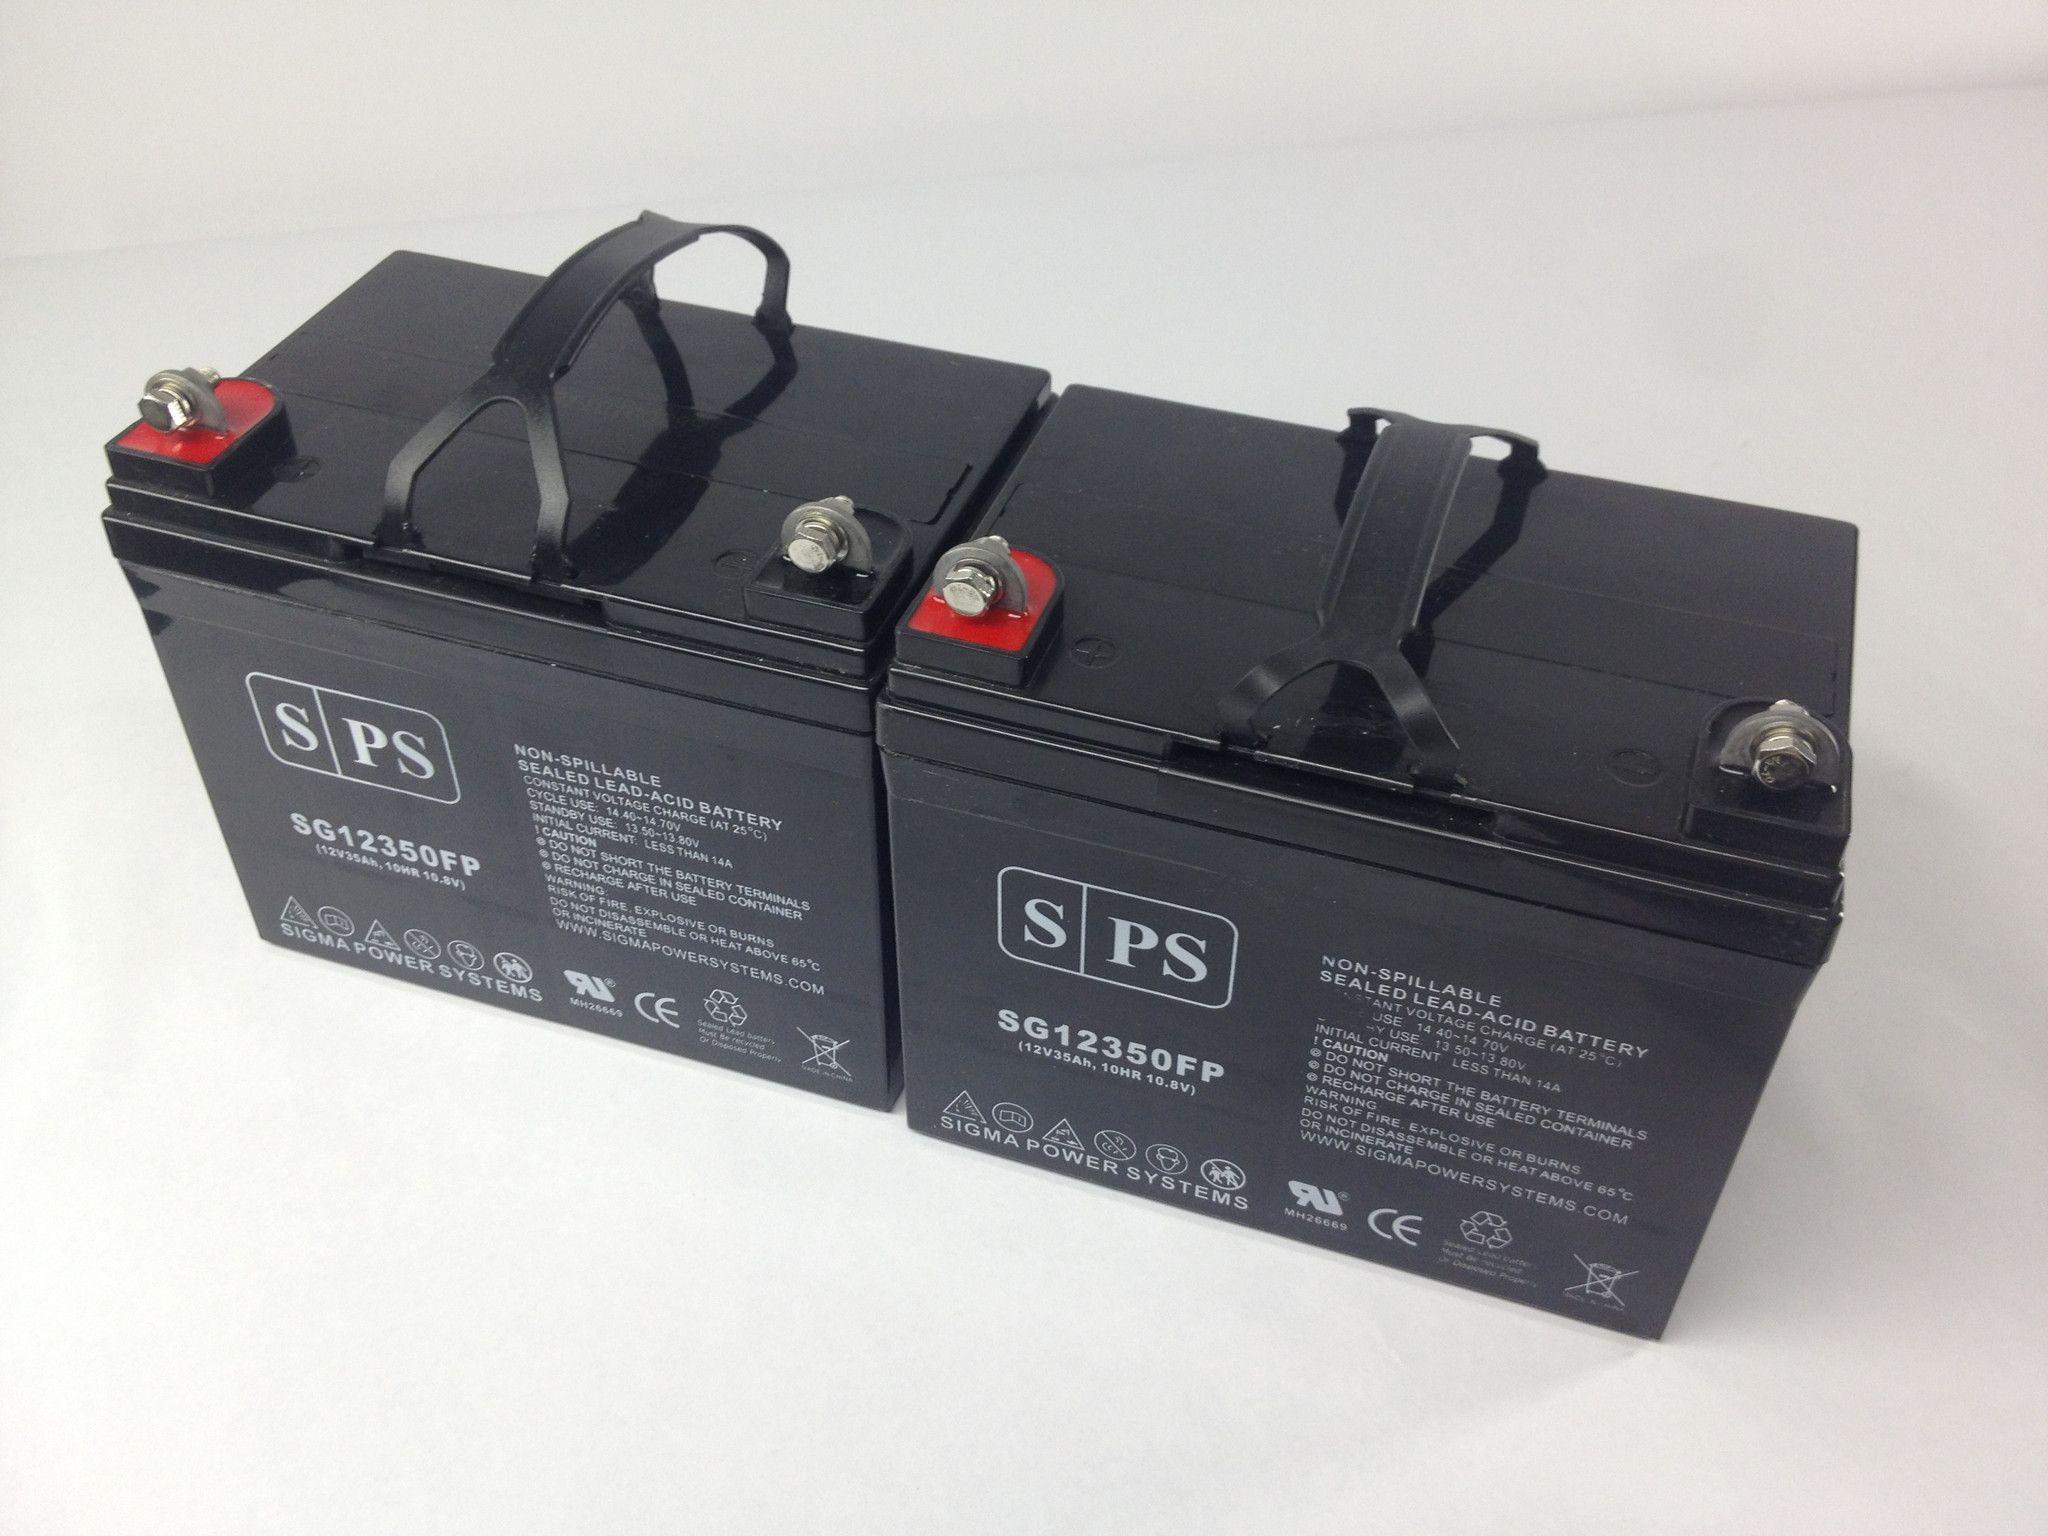 wheel chair batteries ngt fishing bruno pwc 2210 u1 wheelchair scooter battery set